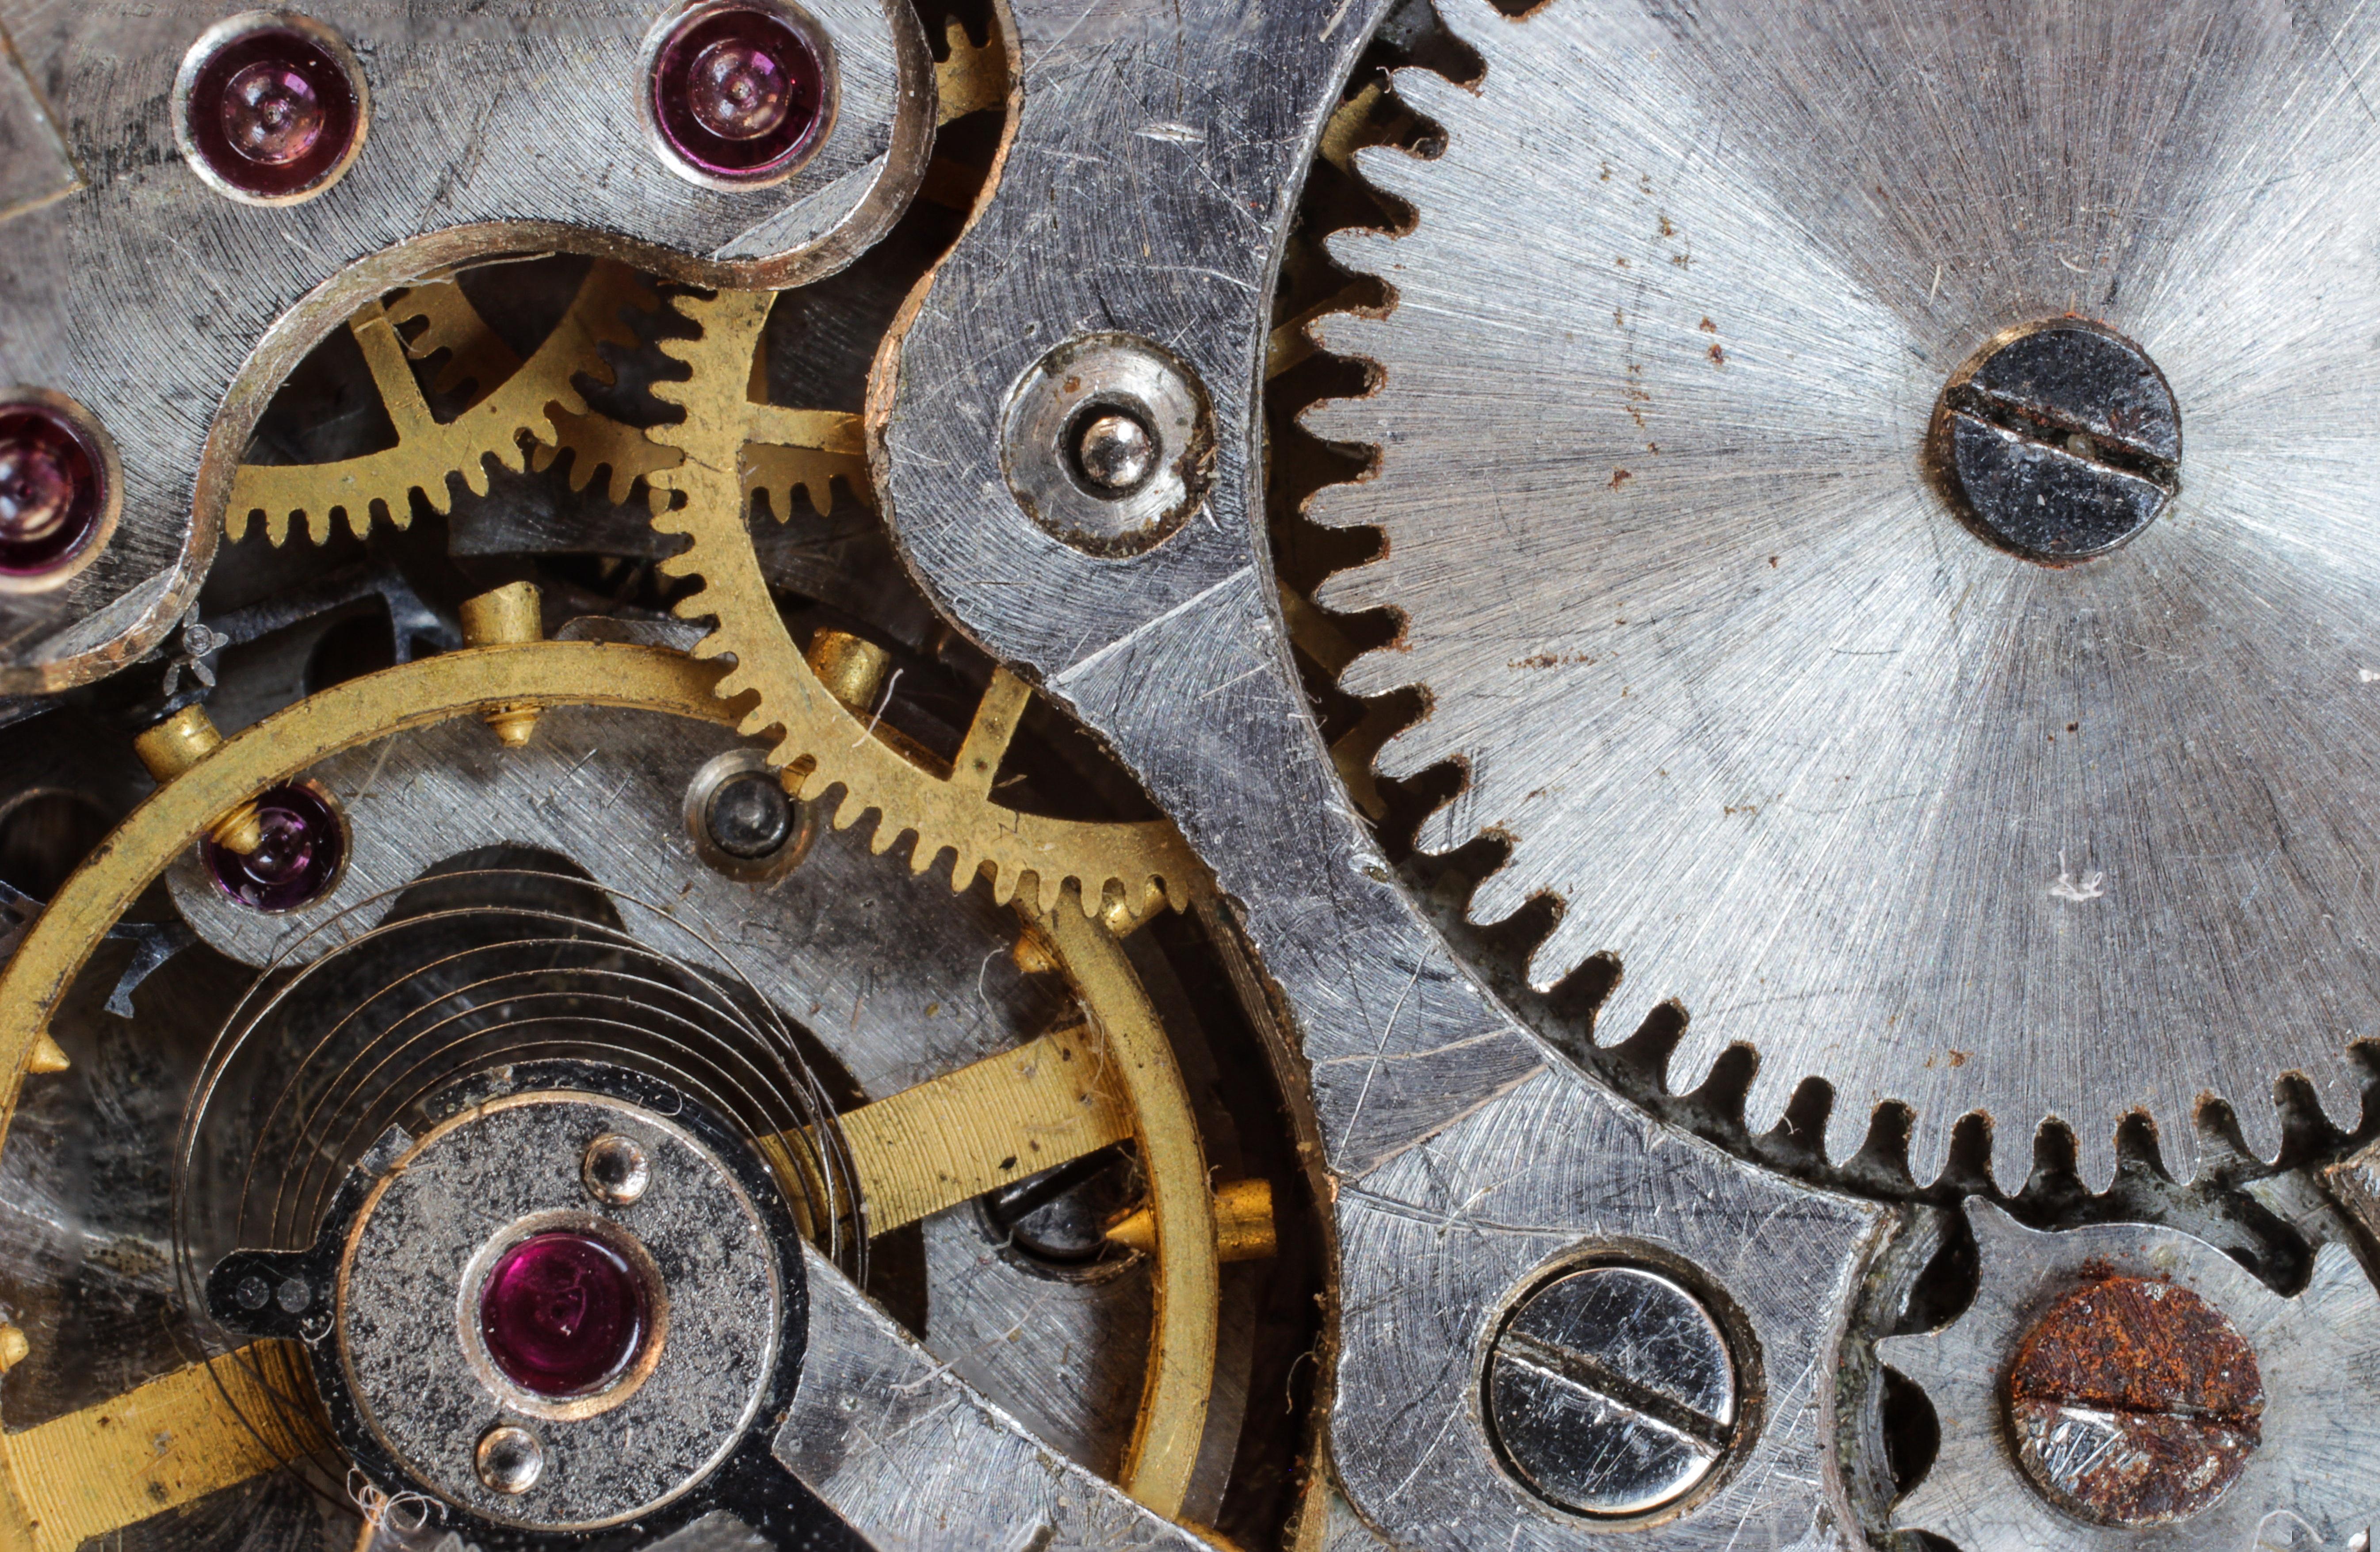 Free Images : work, technology, vintage, wheel, retro, clock, time